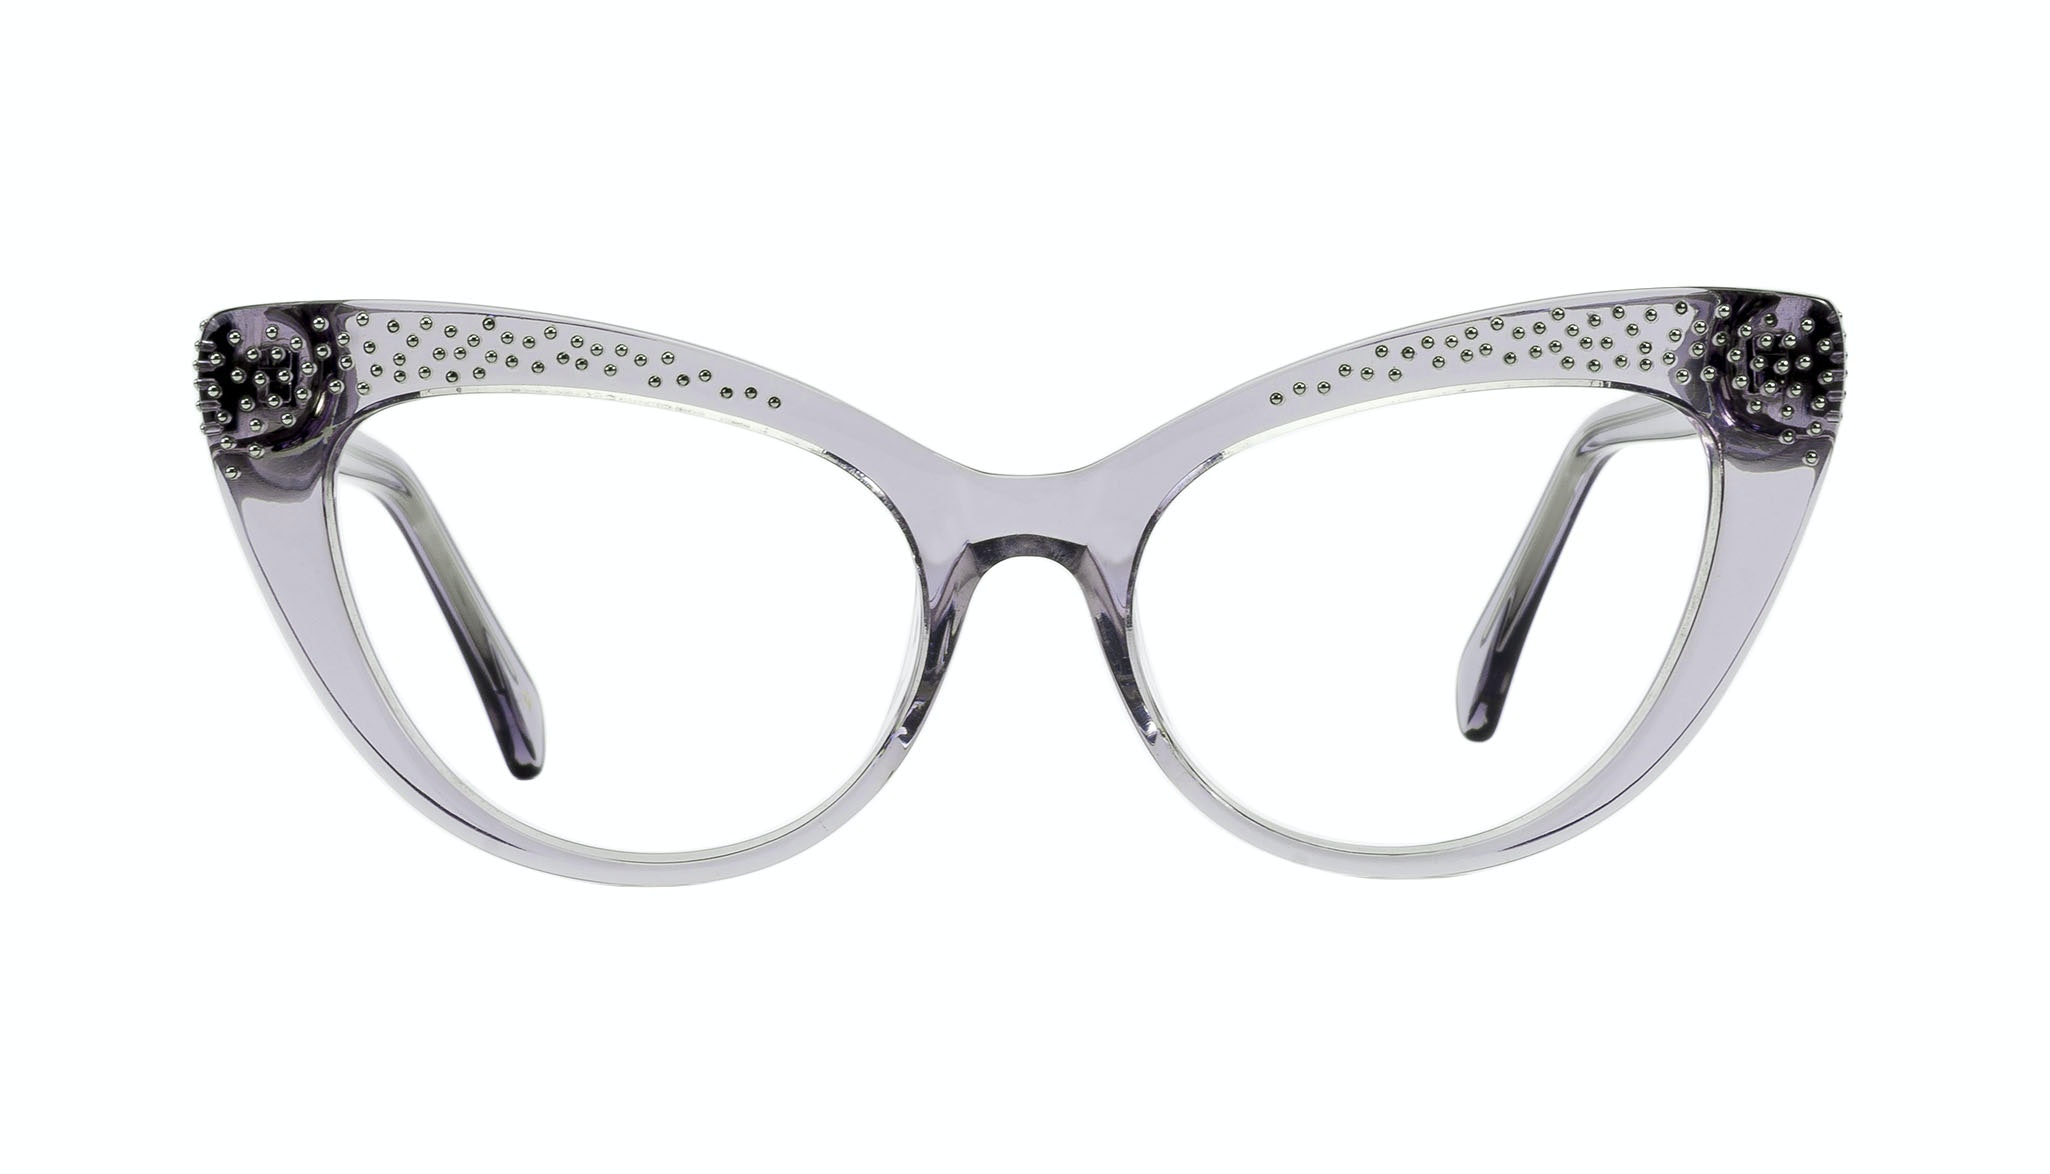 Affordable Fashion Glasses Cat Eye Daring Cateye Eyeglasses Women Keiko Moe May Front